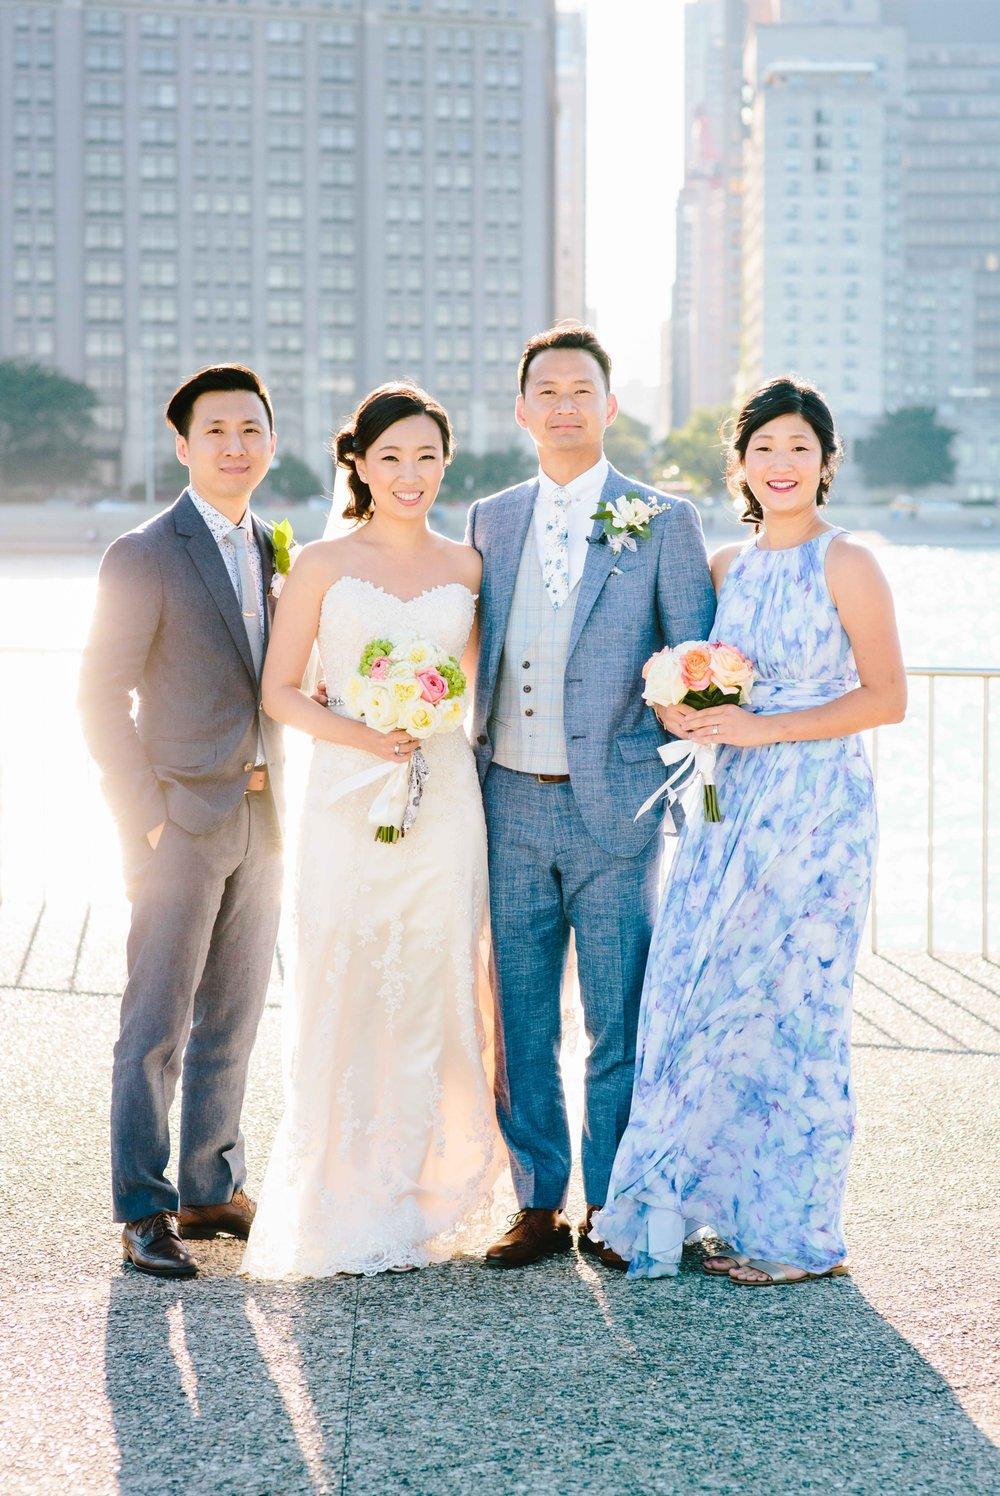 chicago-fine-art-wedding-photography-rayandsilvia15